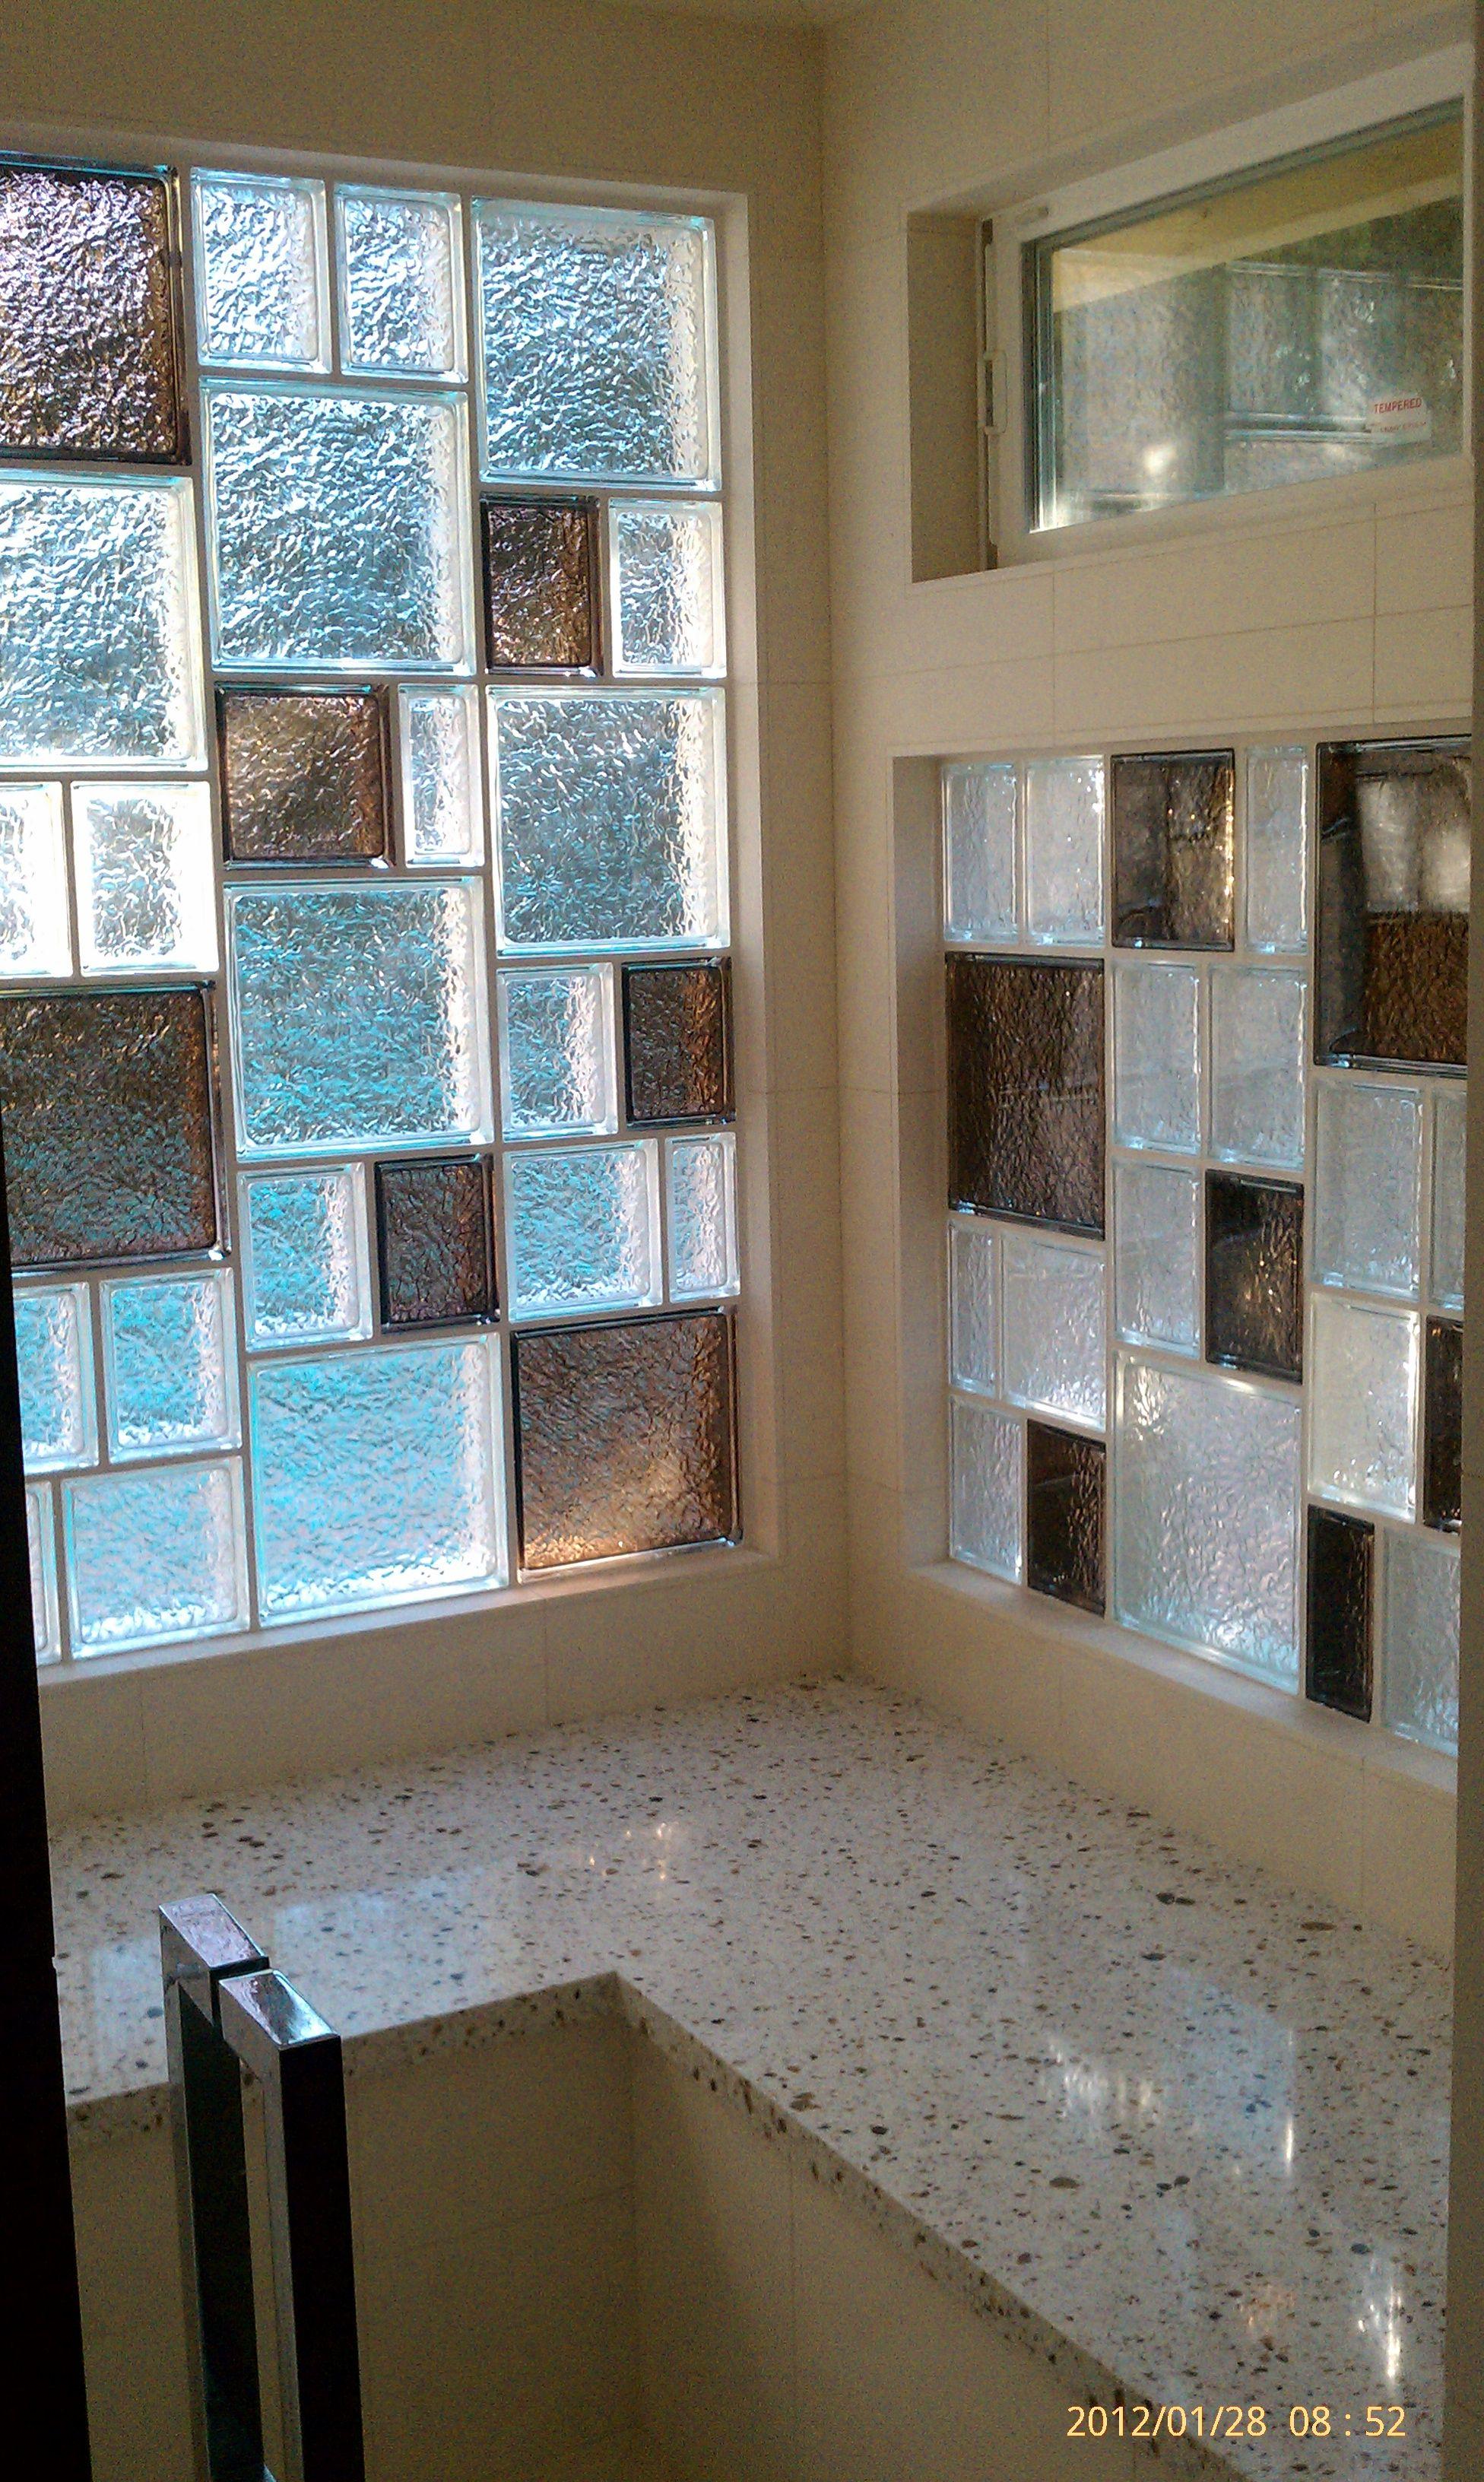 Glass block walls in bathrooms - The Prefabricated Vinyl Framed Glass Block Window Also Uses 6 X8 Decora Glass Blocks